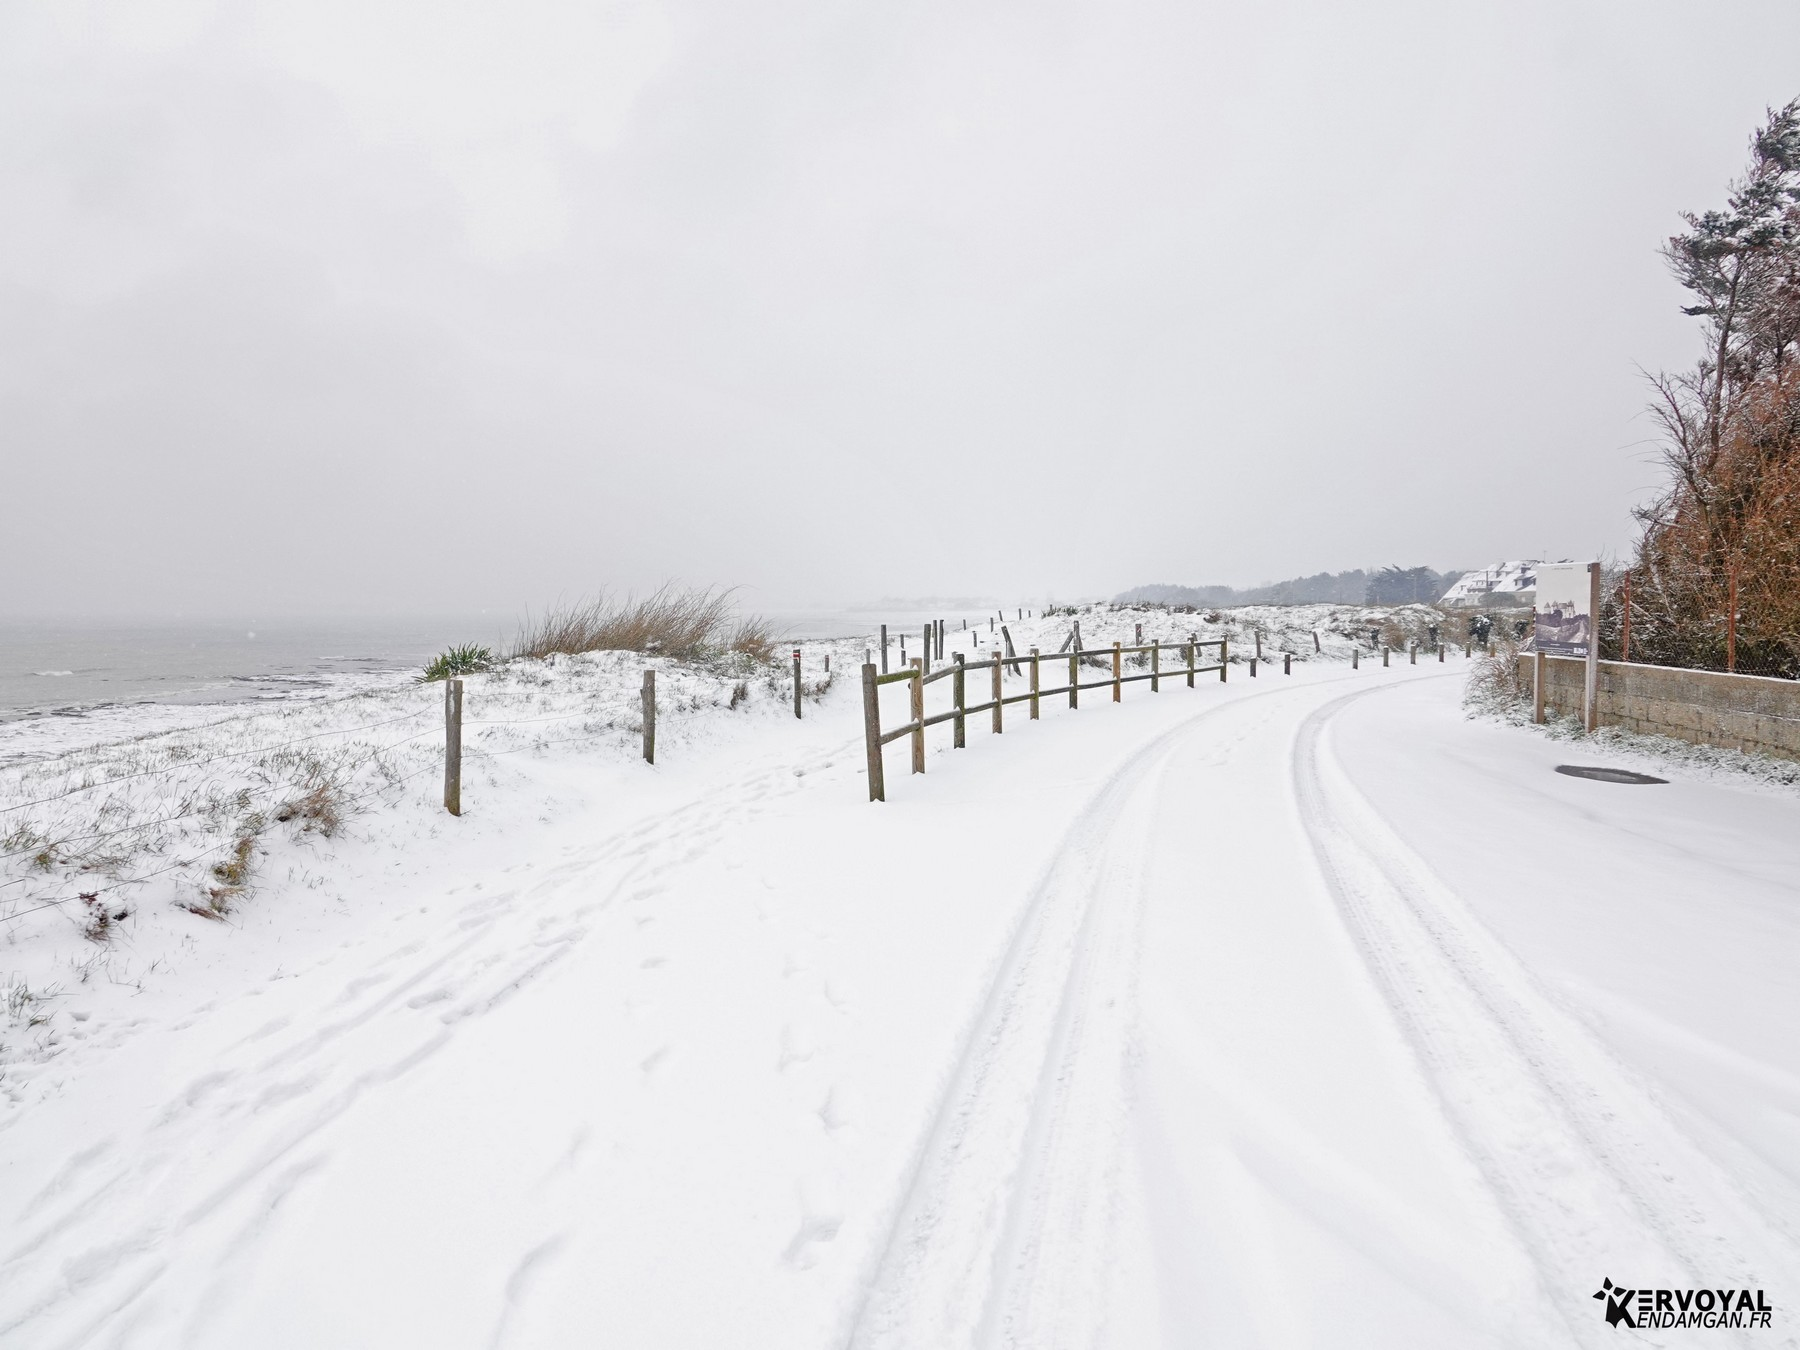 neige à kervoyal 11 février 2021 damgan morbihan (6)